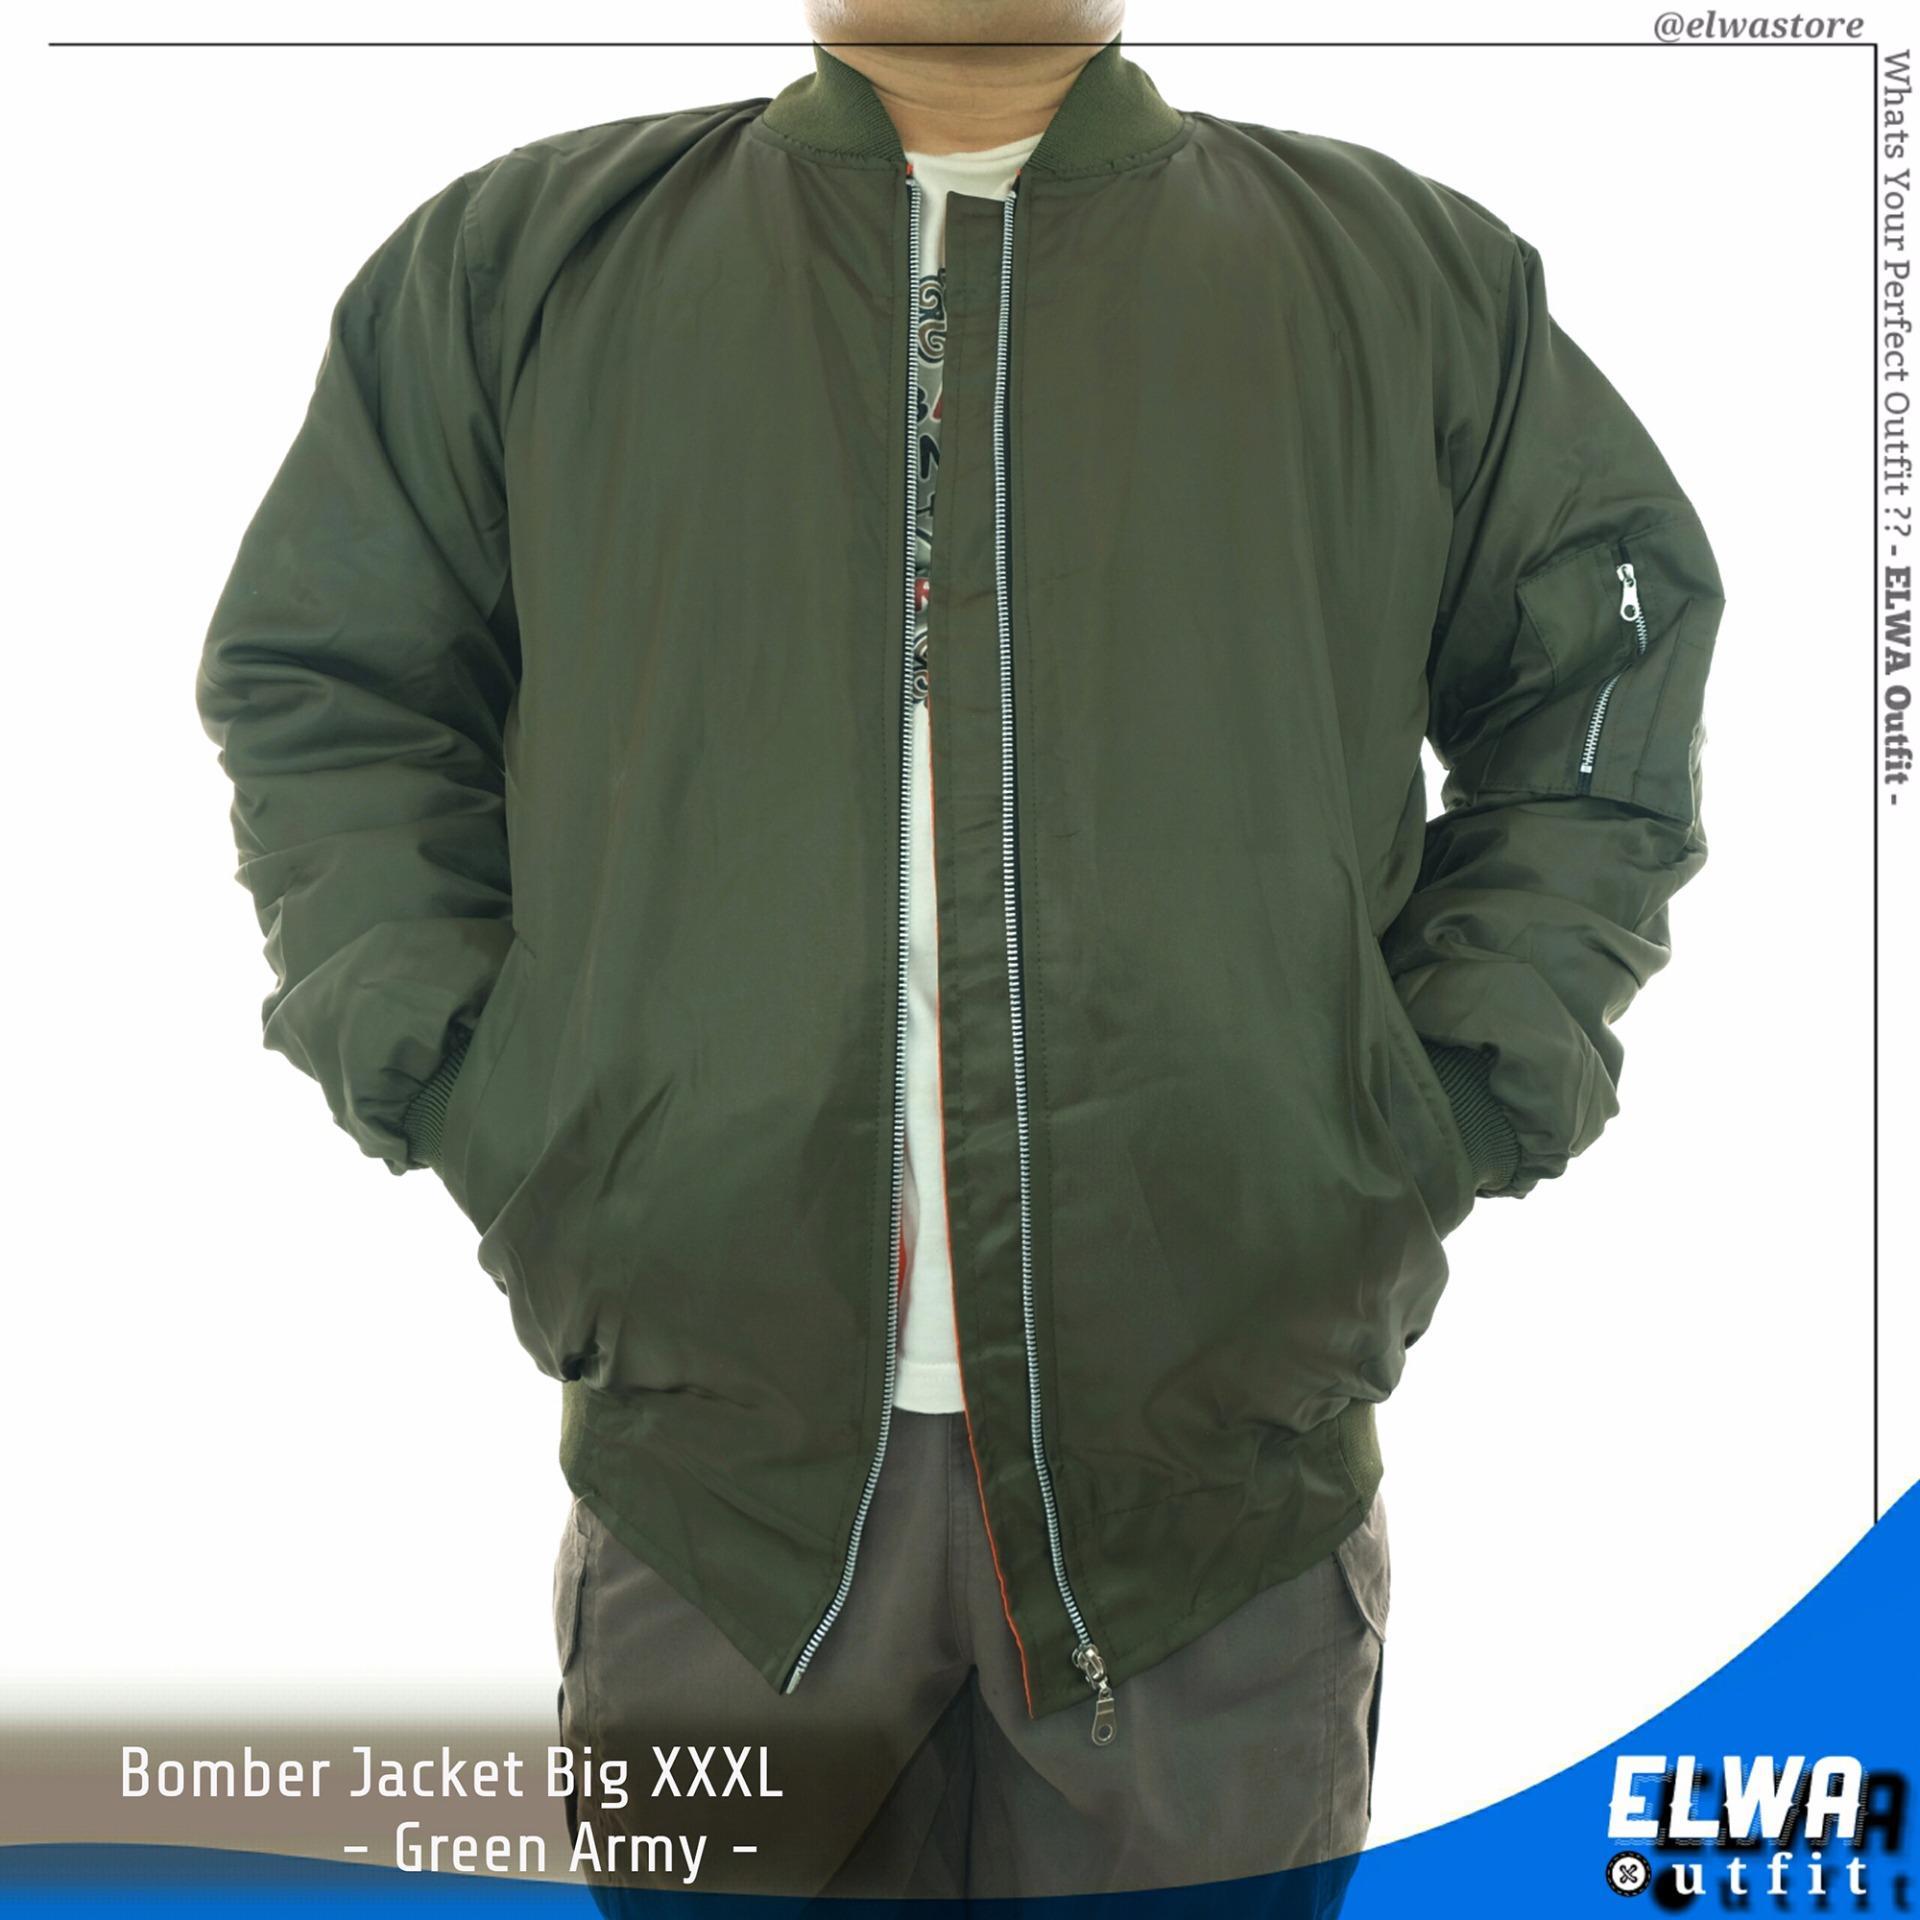 Spesifikasi Jaket Bomber Pria Jumbo Big Size Xxxl Greenarmy Yang Bagus Dan Murah